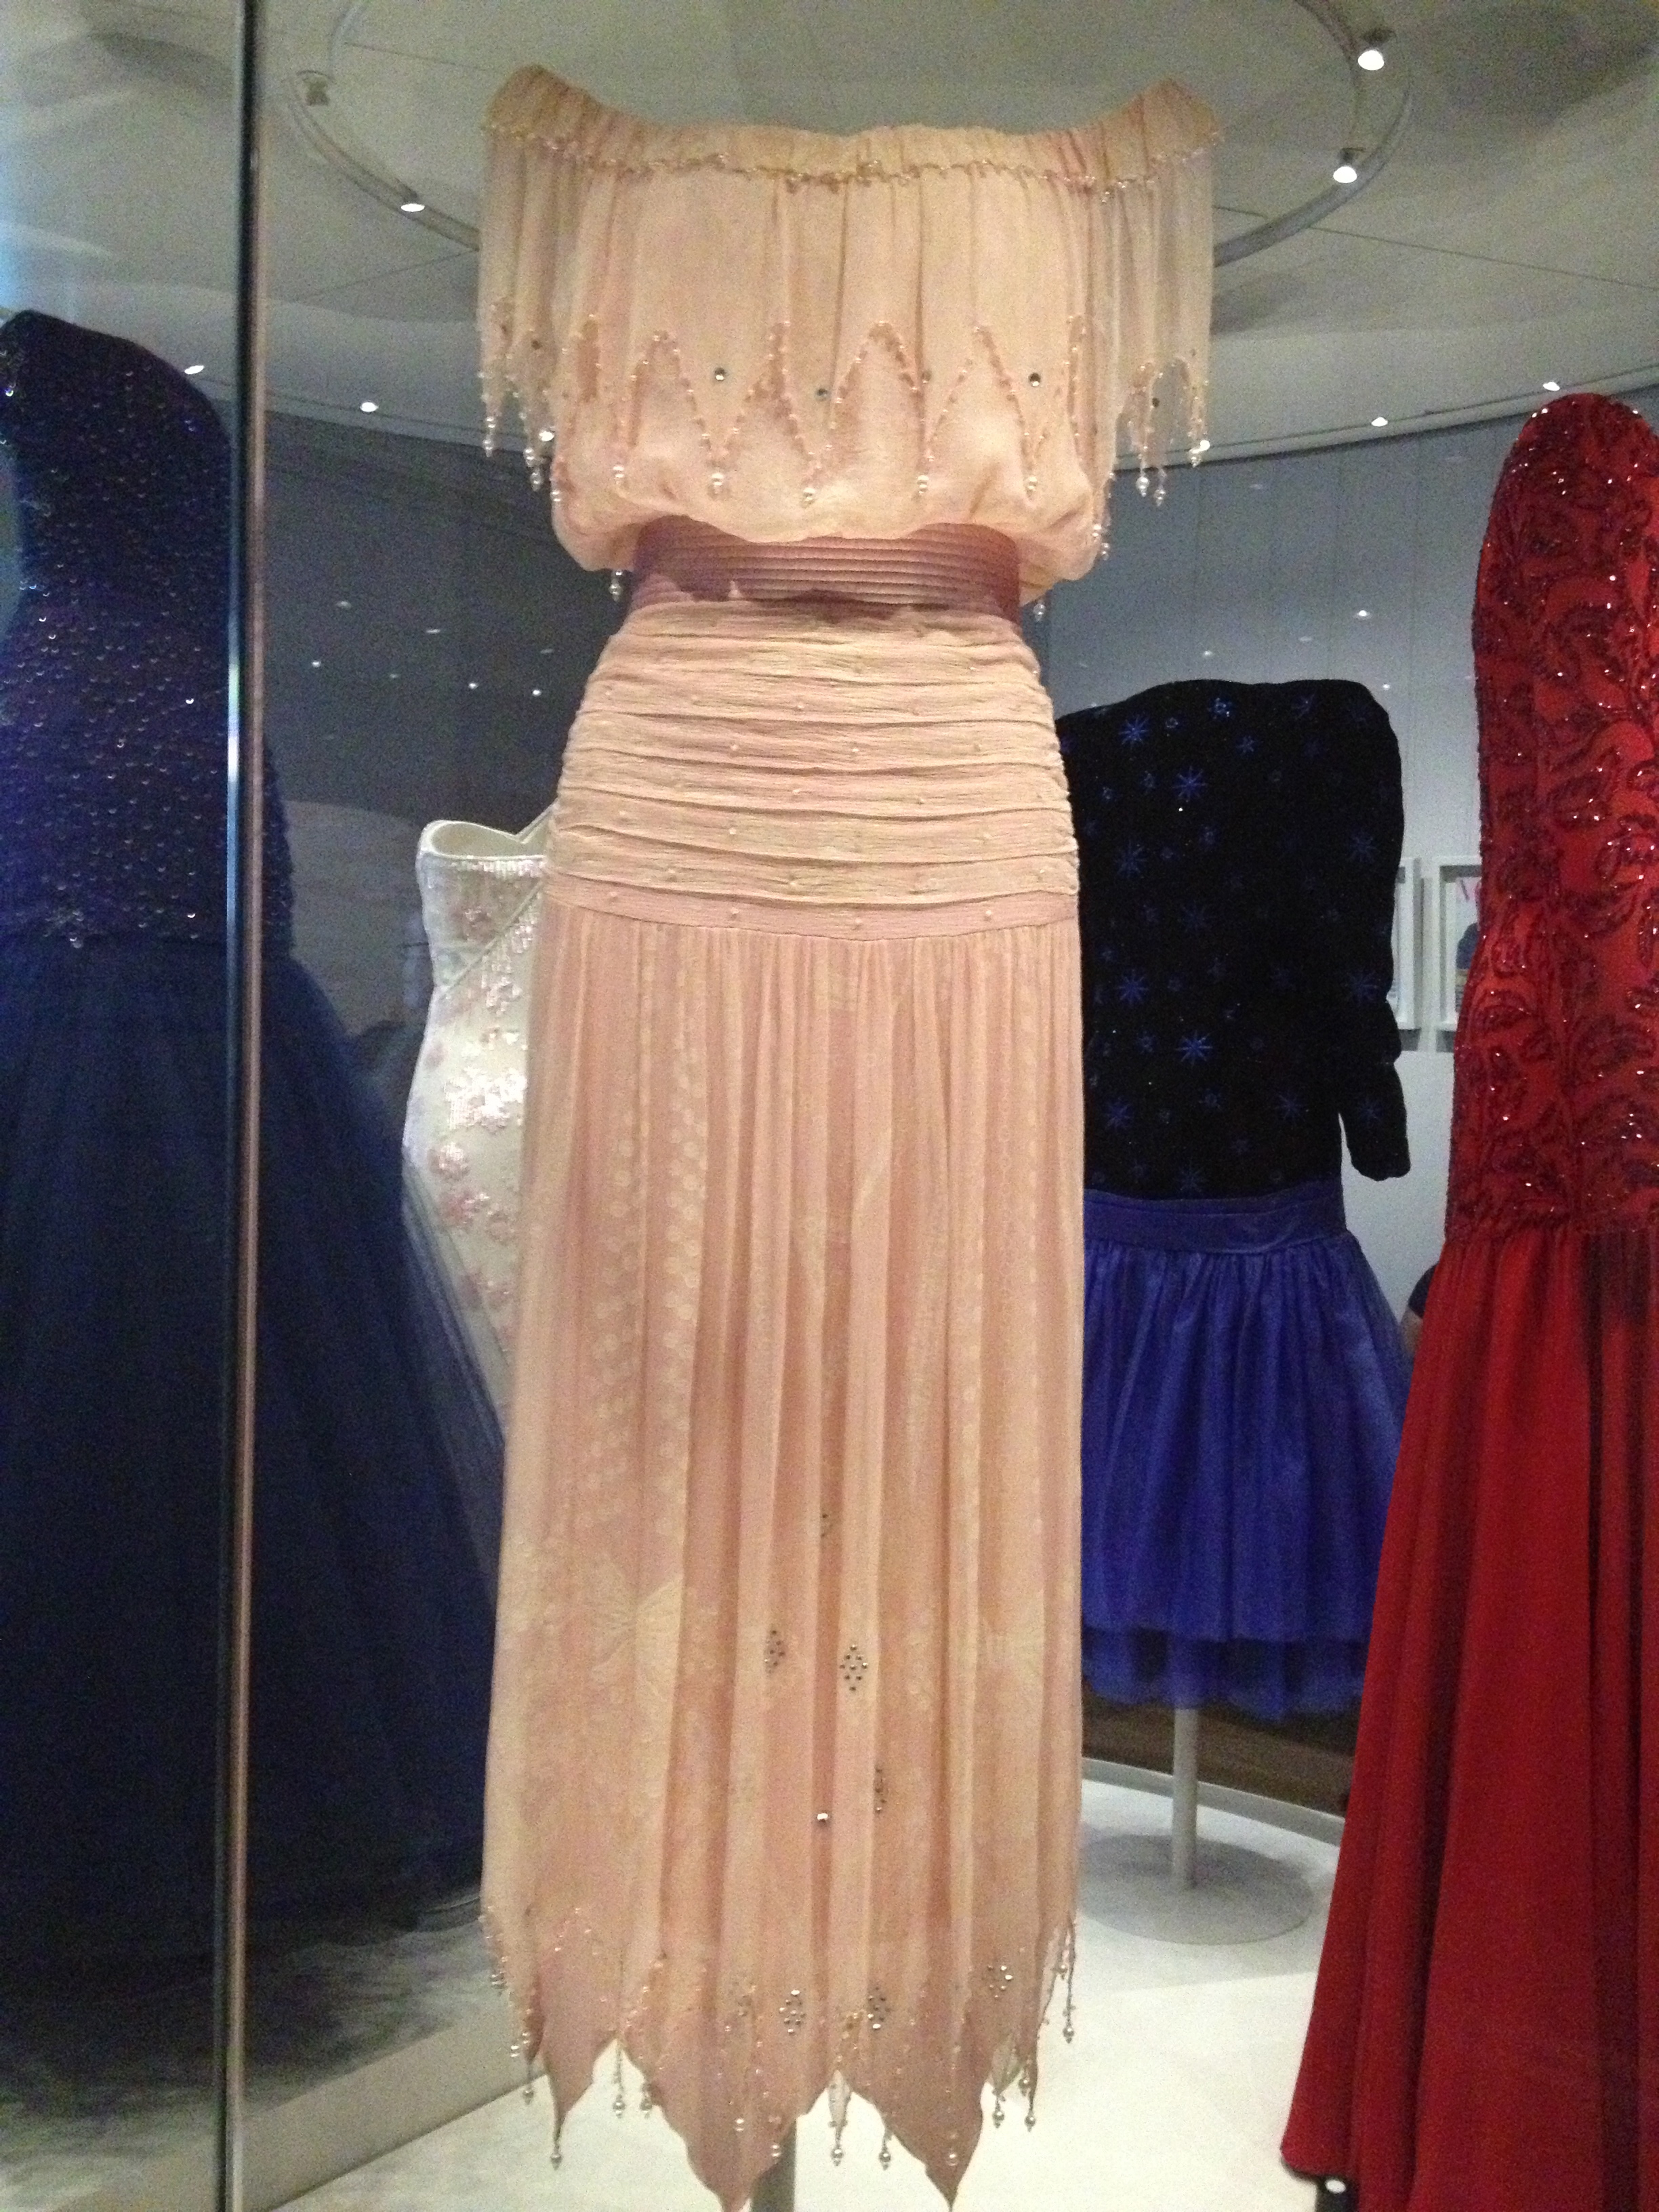 Fashion Rules at Kensington Palace - London